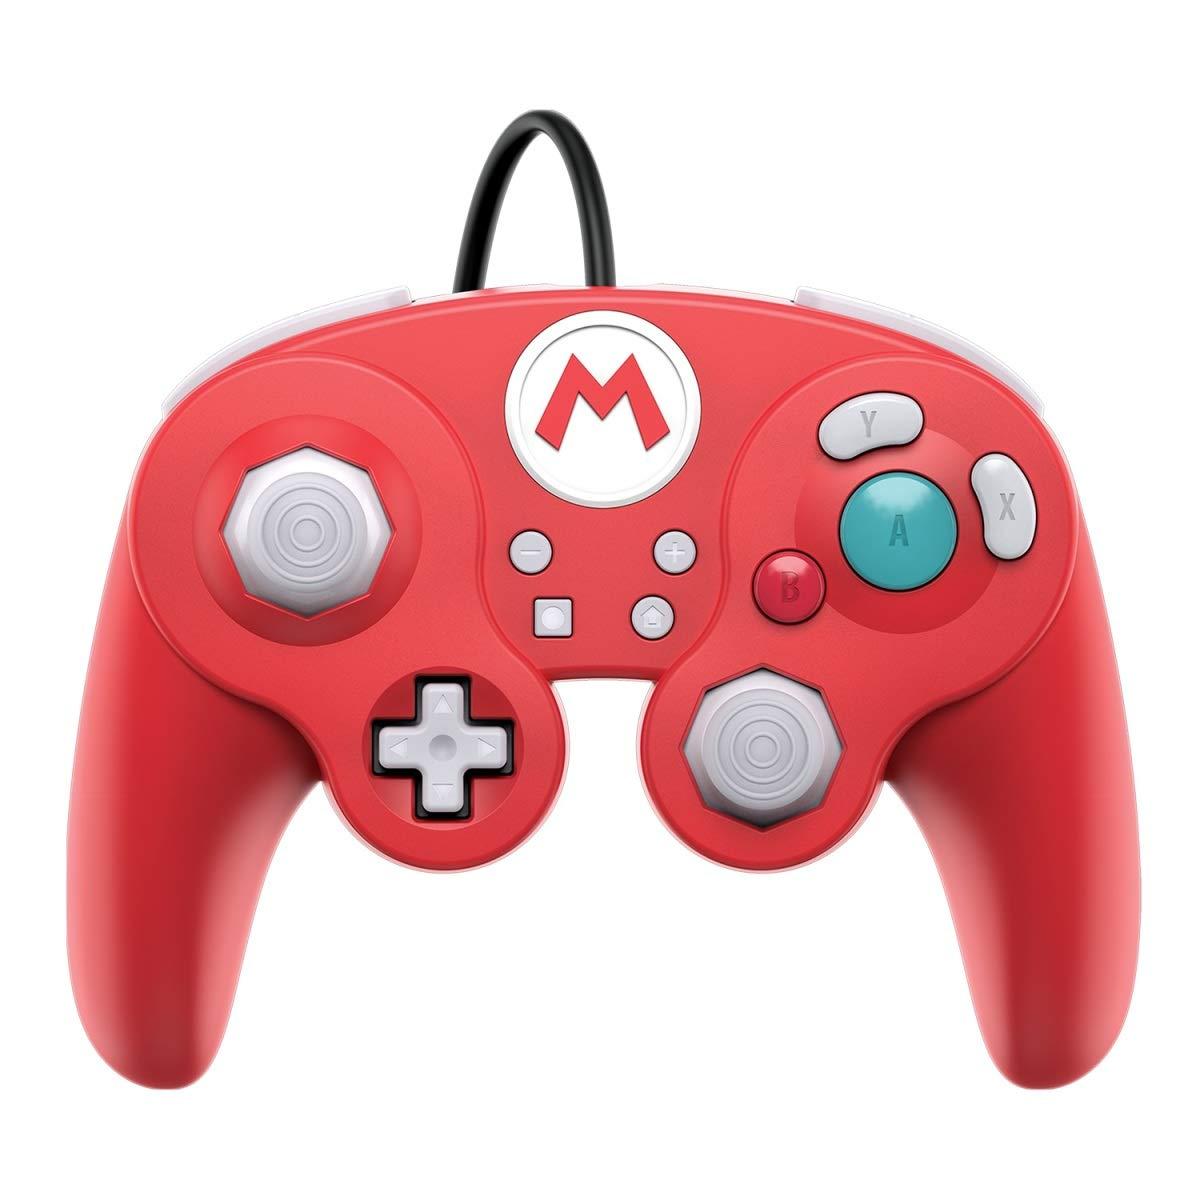 PDP Nintendo Switch GameCube Style Wired Pro Controller - Mario or Luigi - $14.99 @ Amazon + FSSS